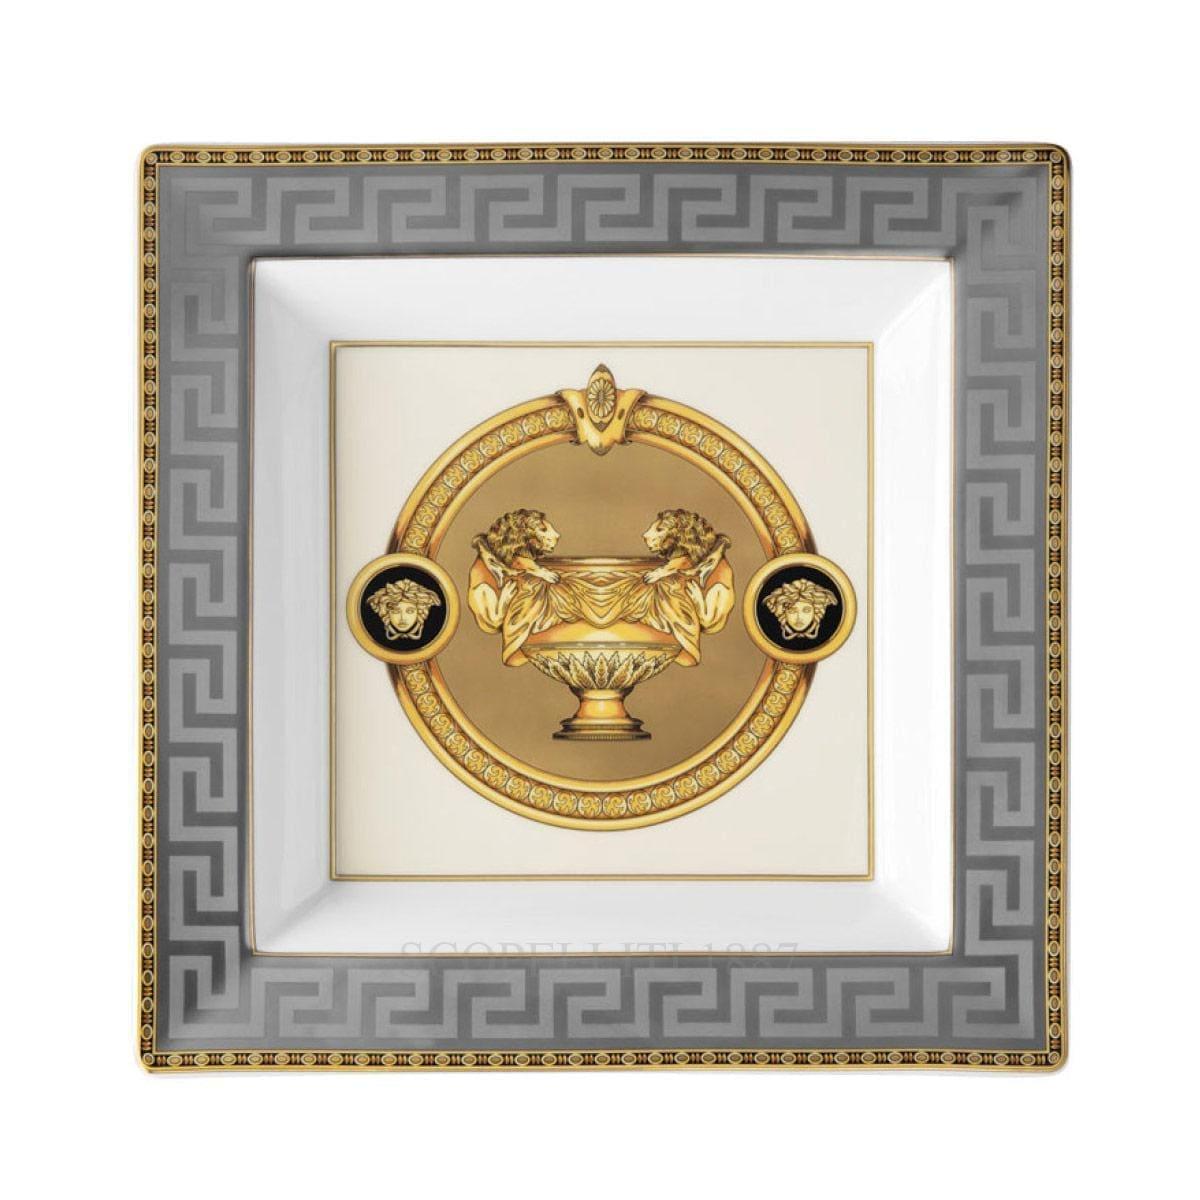 Versace Prestige Gala Square Dish 22 cm by Rosenthal